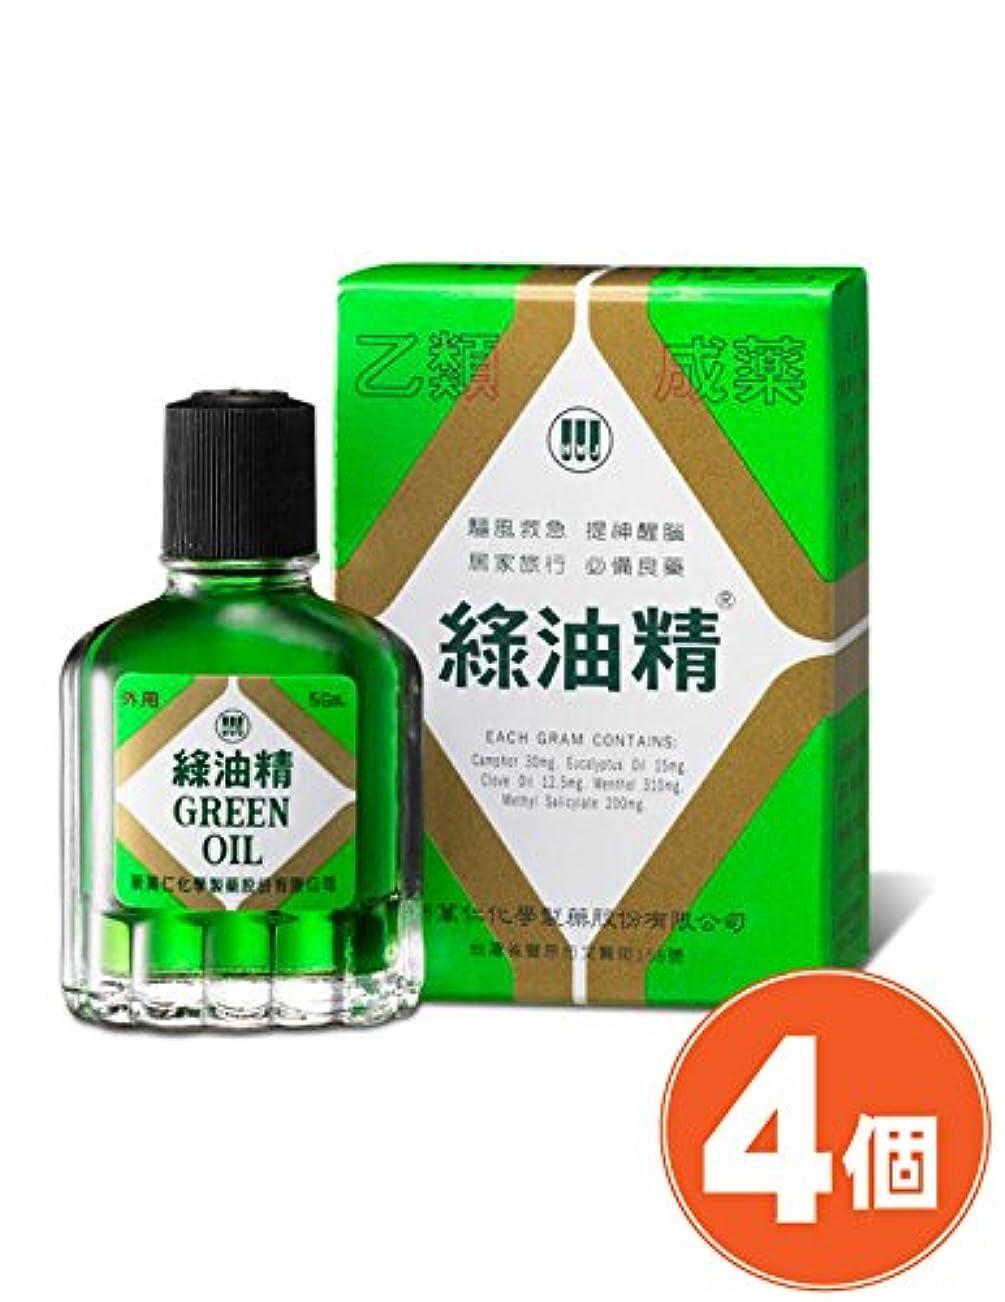 証人表面臨検《新萬仁》台湾の万能グリーンオイル 緑油精 5g ×4個 《台湾 お土産》 [並行輸入品]